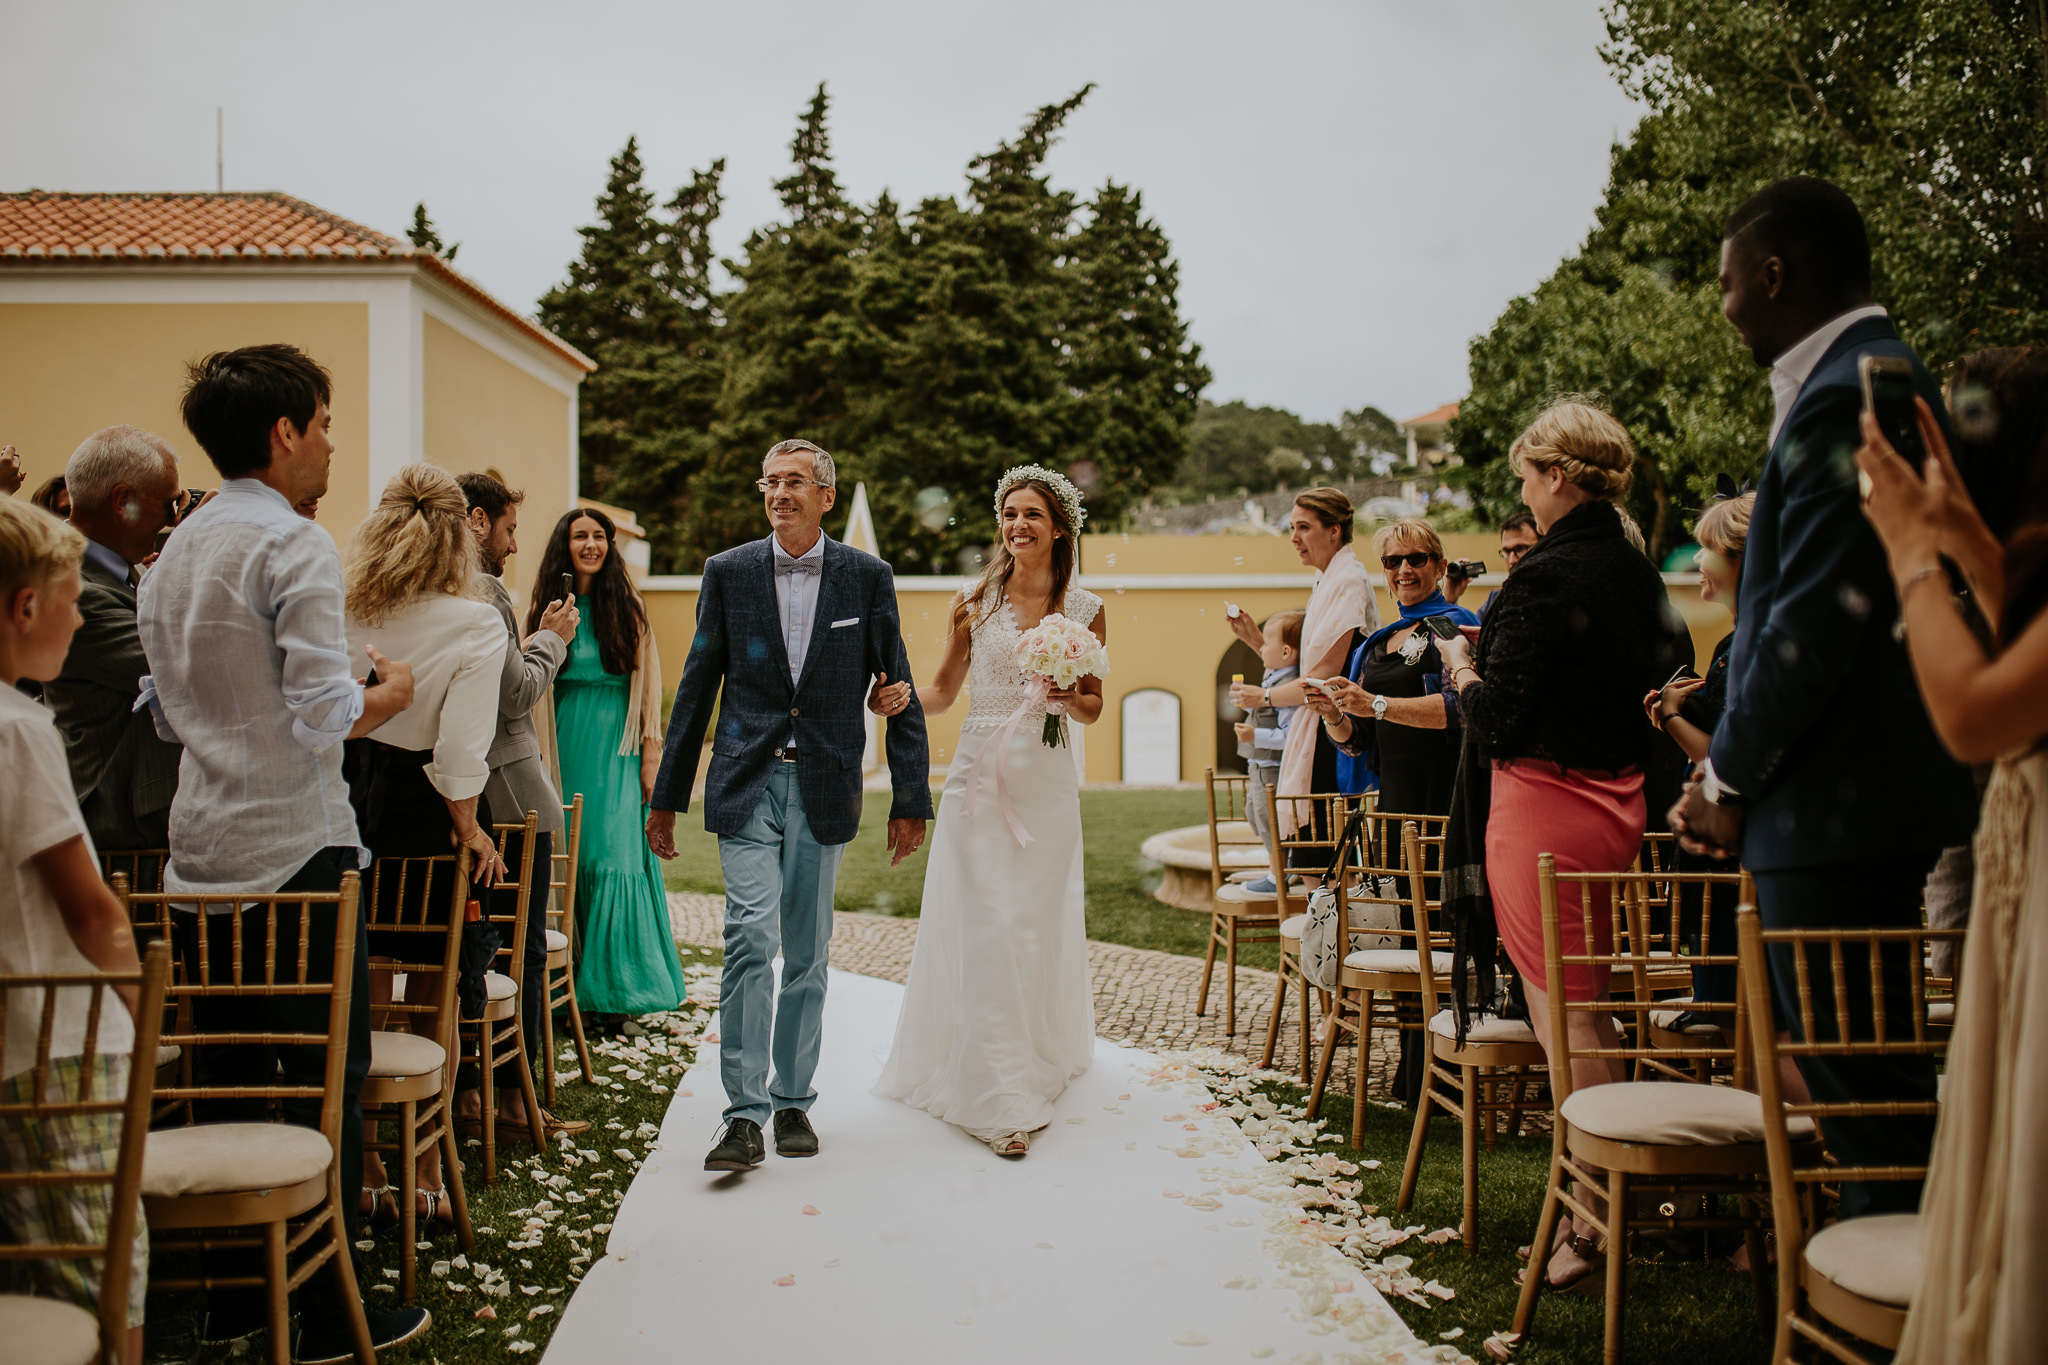 romina_thomas_destination_wedding_photography_fotografia_de_casamento_lisbon_sintra_penha_longa_resort-22